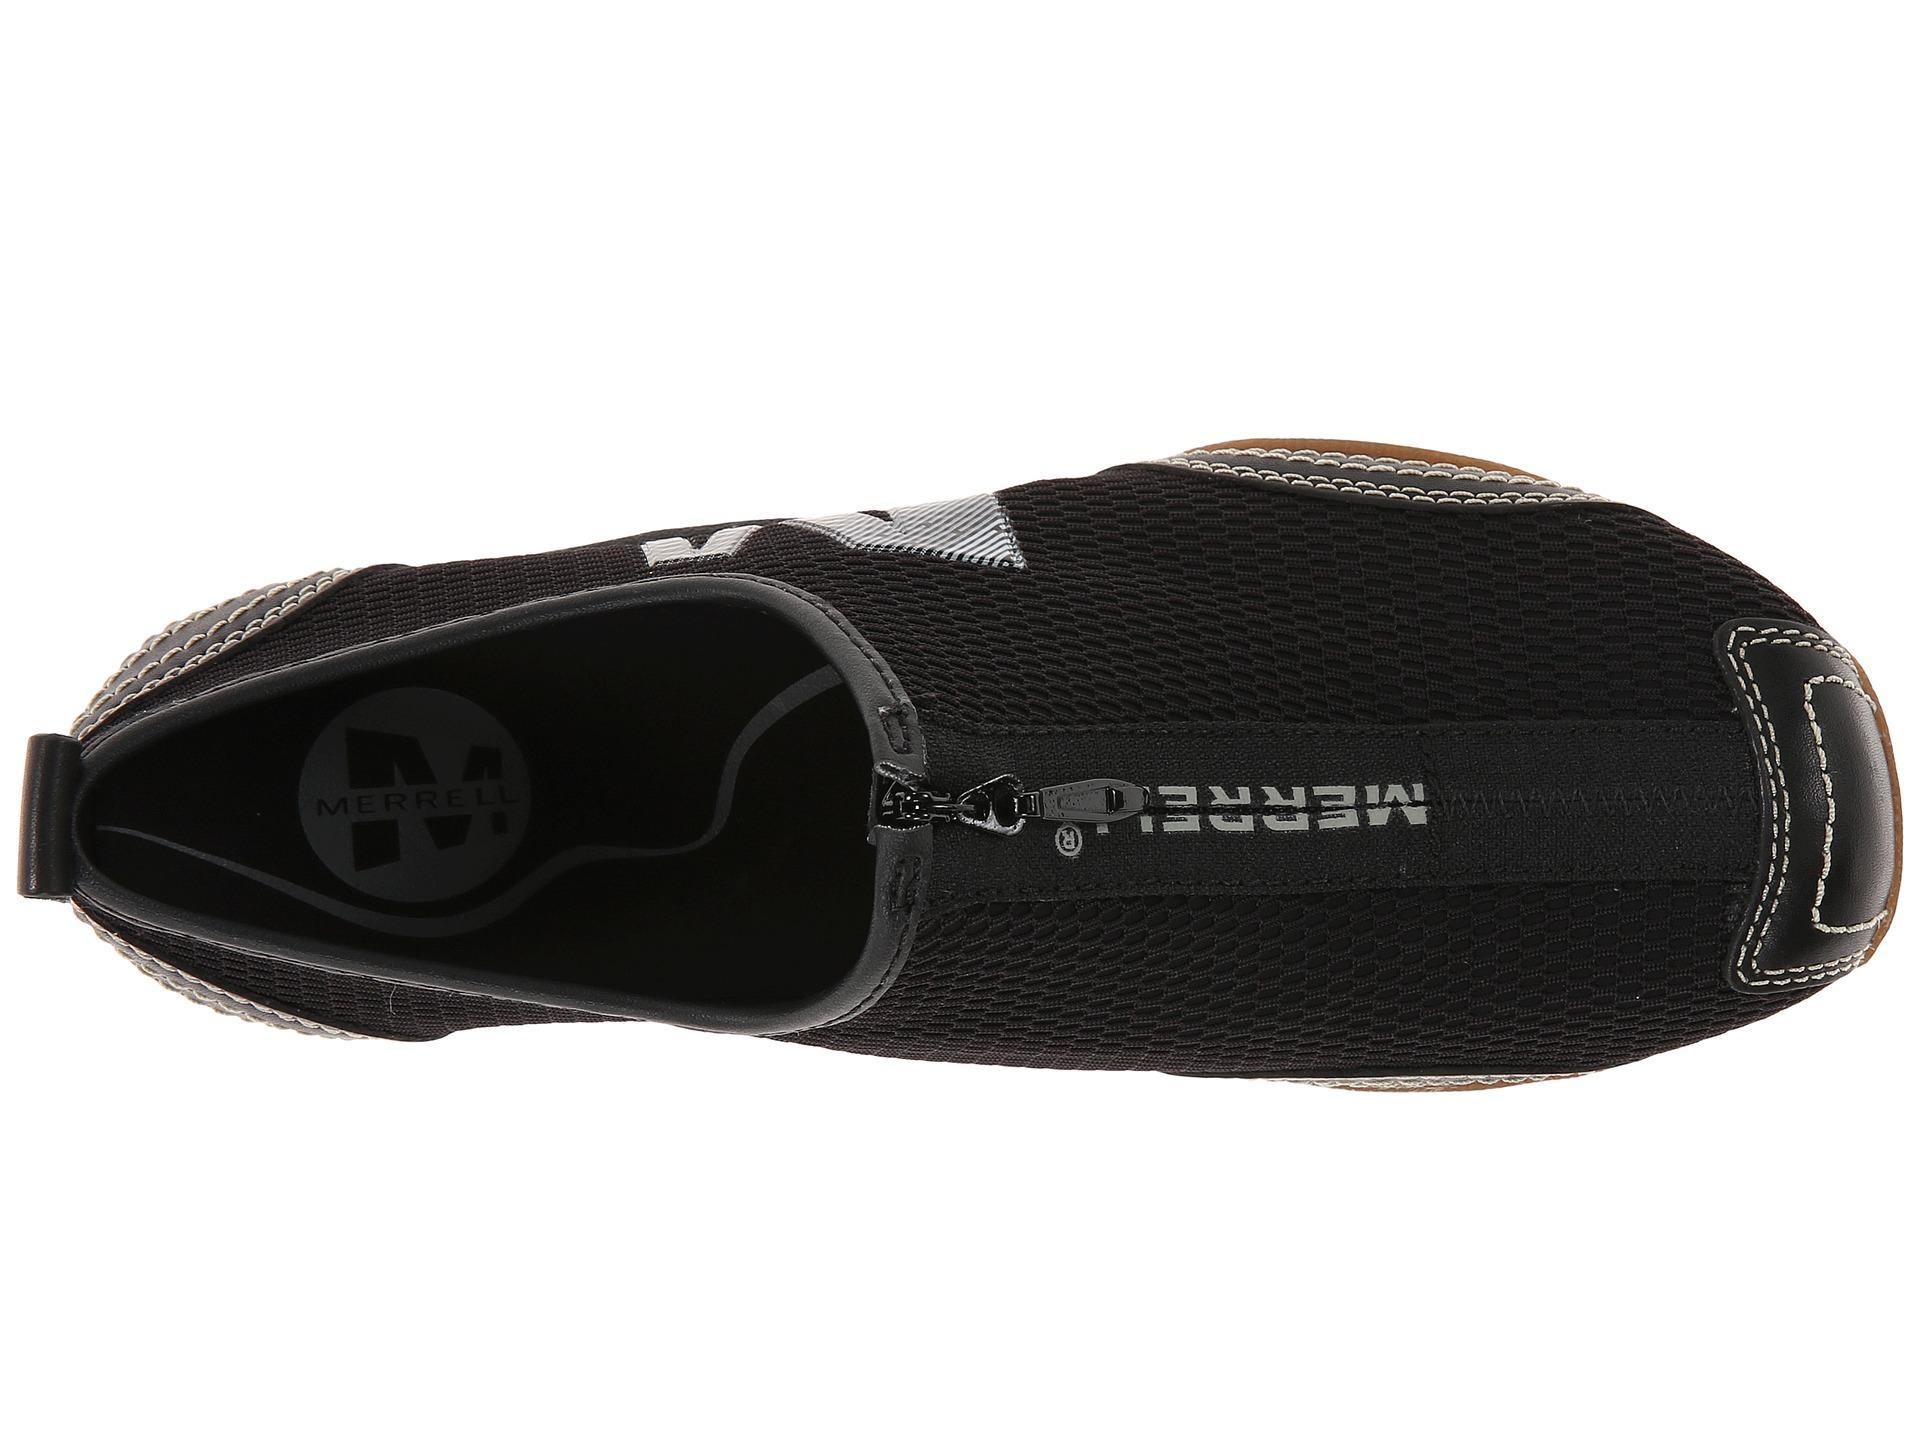 Barrado Black Merrell Shoes